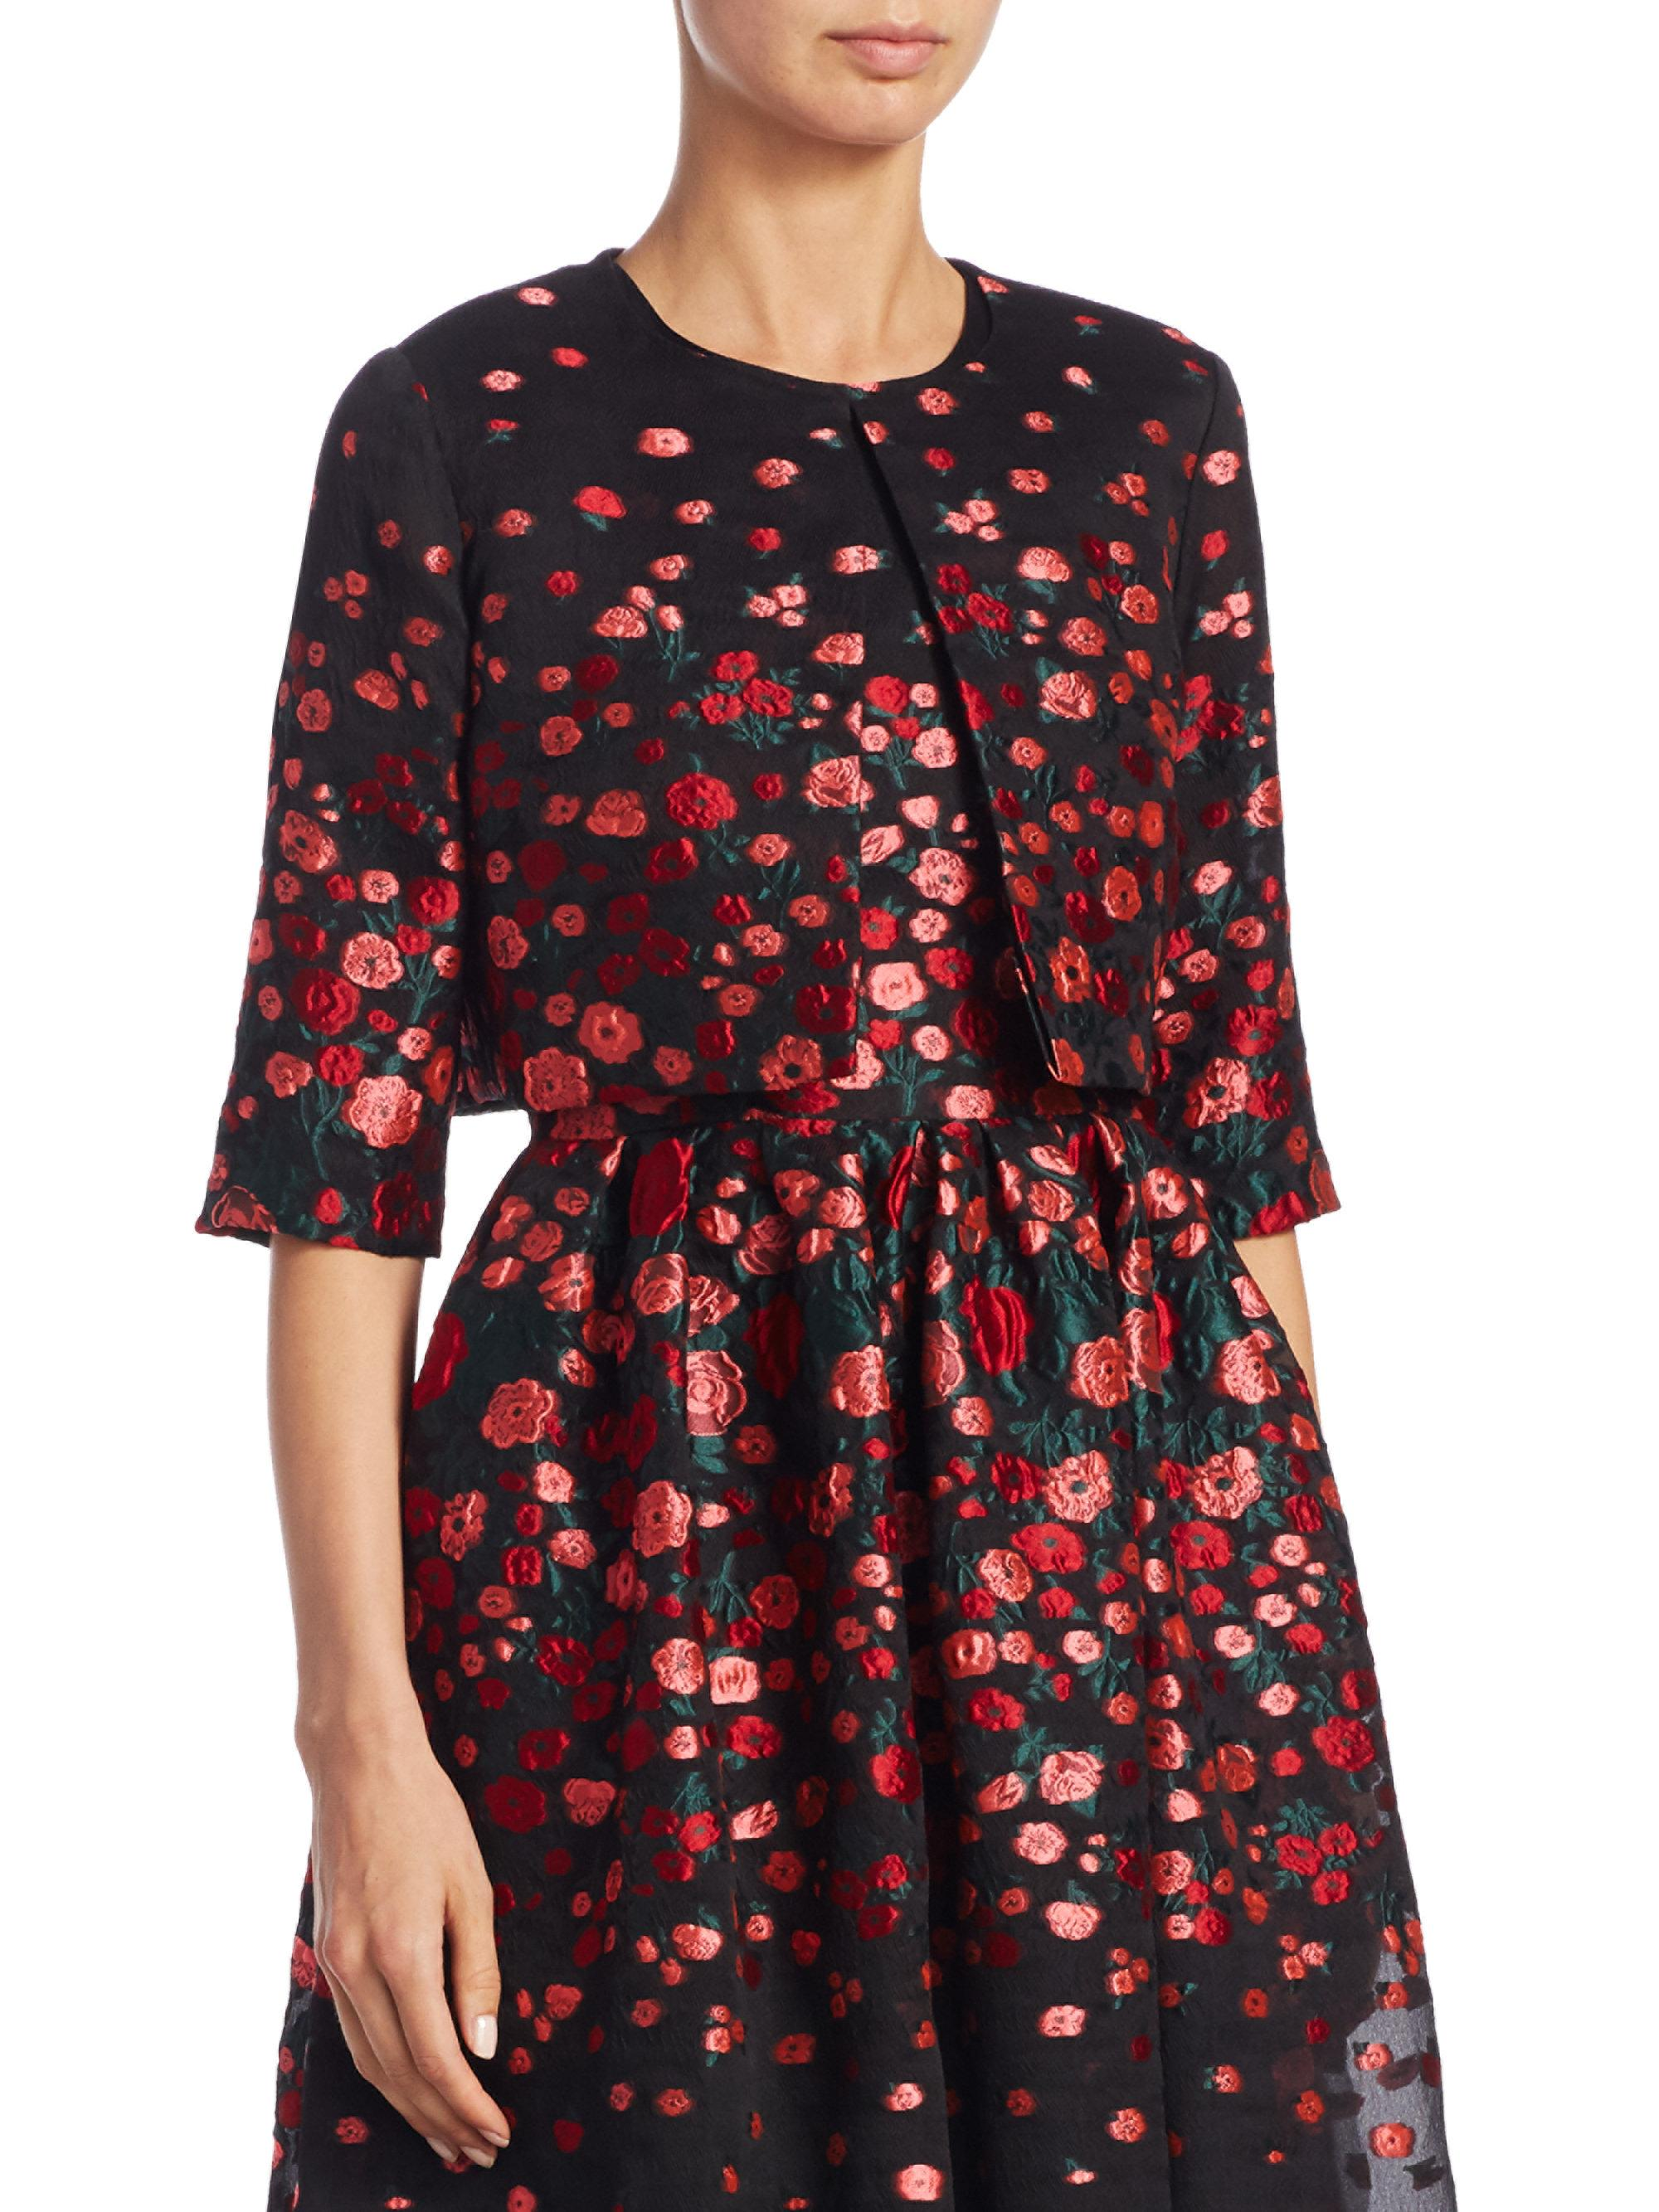 0124188226c1e Lela Rose Cropped Floral Silk Jacket in Black - Lyst